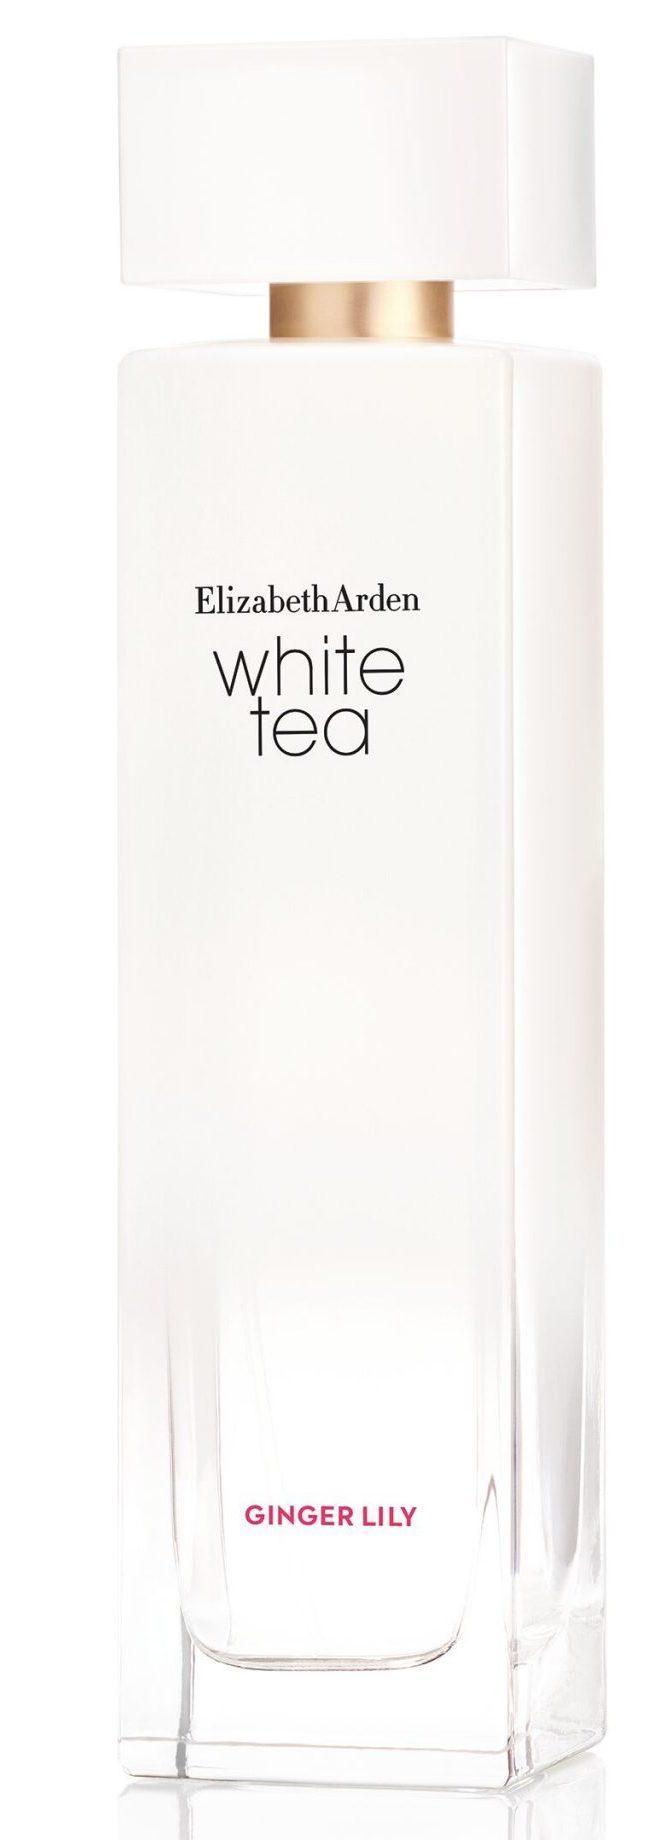 ELIZABETH_ARDEN_WHITE_TEA_GINGER_LILY